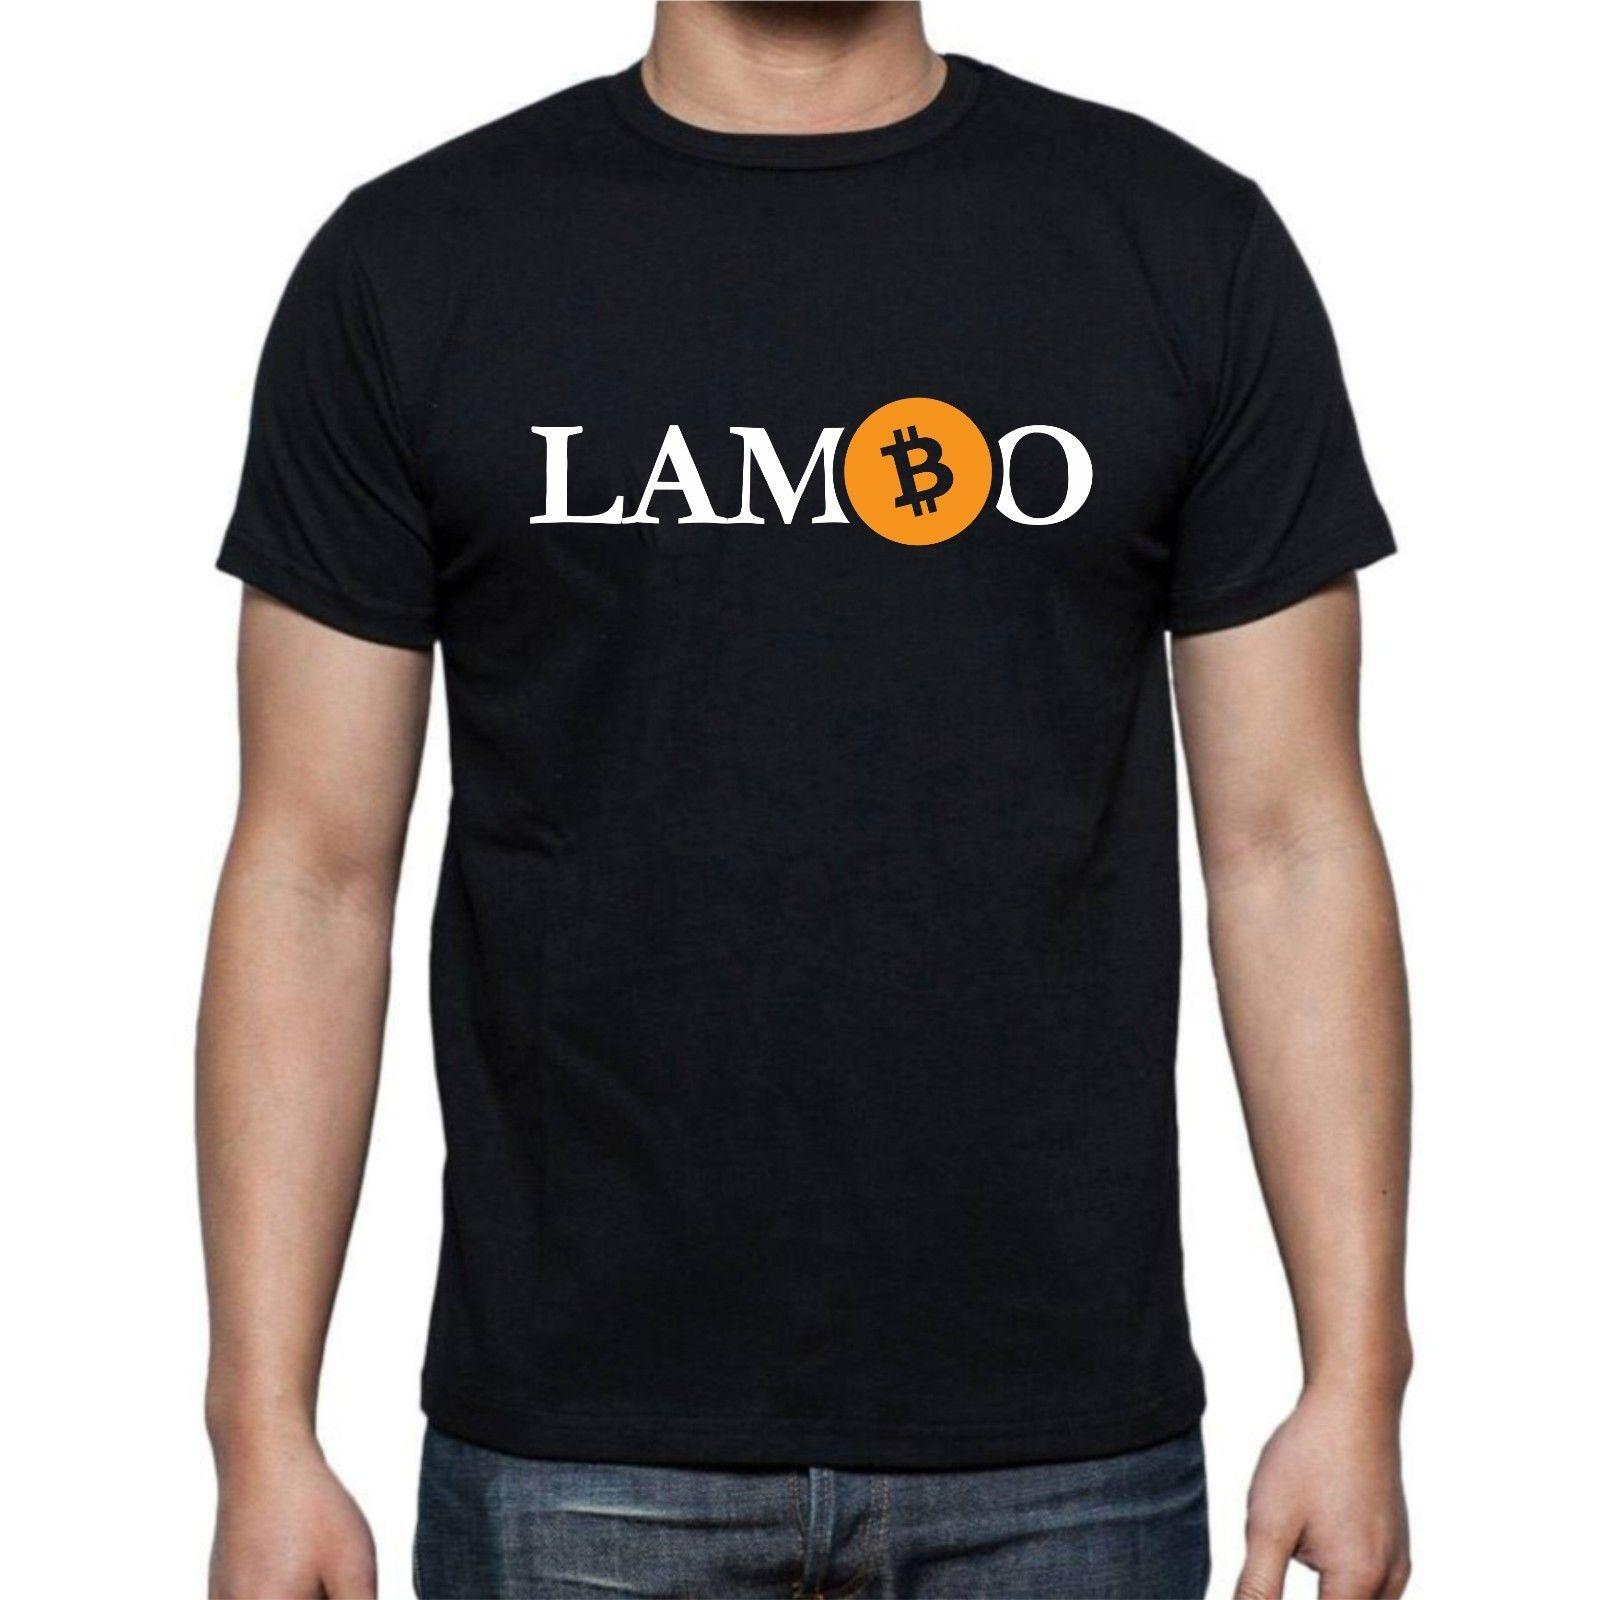 a38c5529 Bitcoin BTC Lambo Cryptocurrency Logo T Shirt Crypto Hodl S XXXL Funny Tee  T Shirt Buy From Goldshop76, $11.48| DHgate.Com